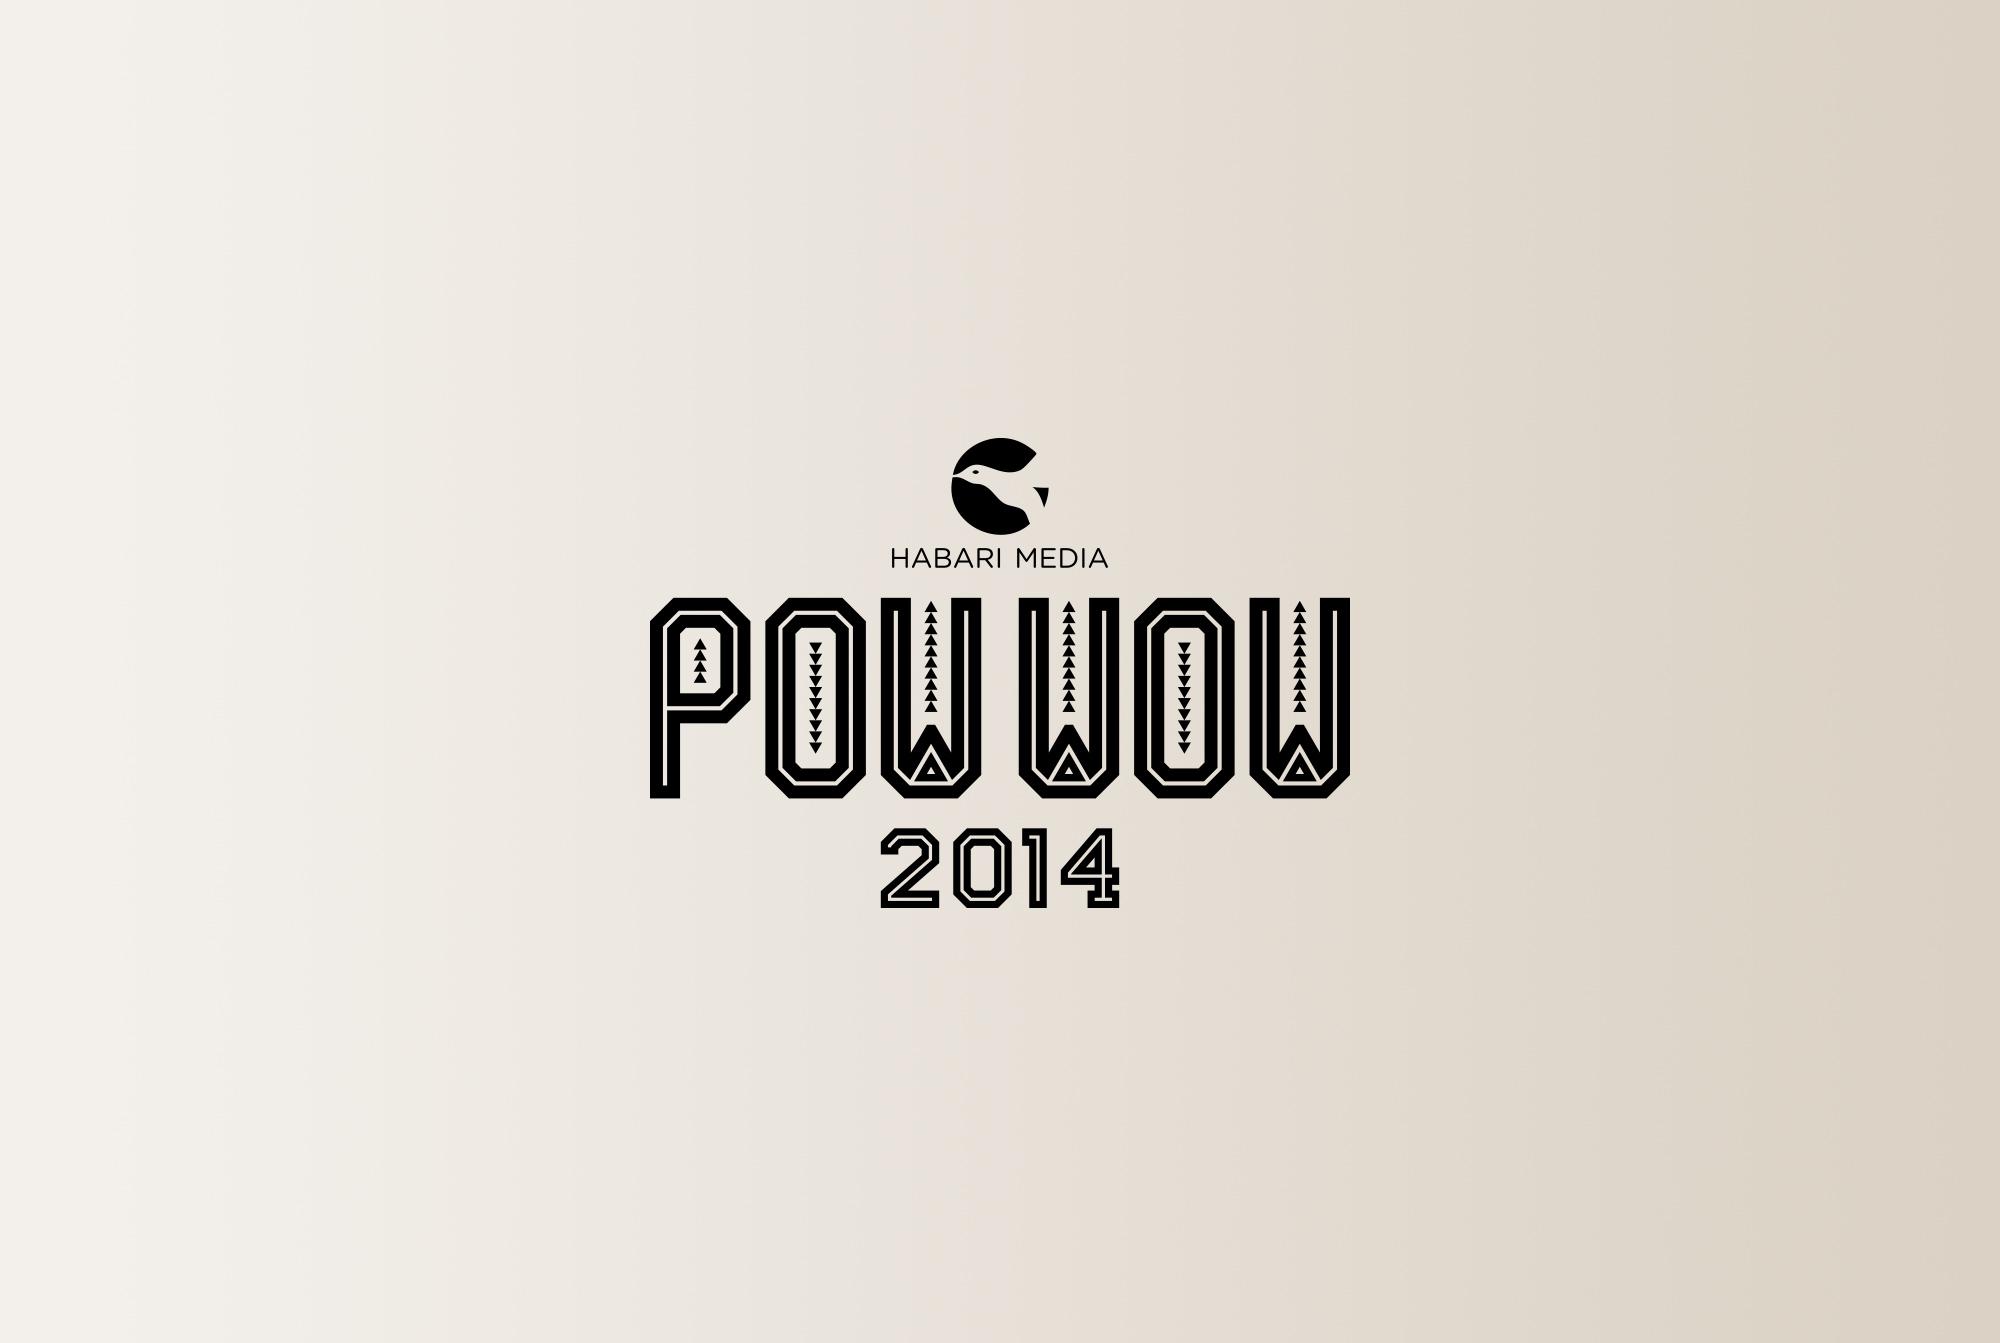 LG_Portfolio 2014_Pow Wow_01